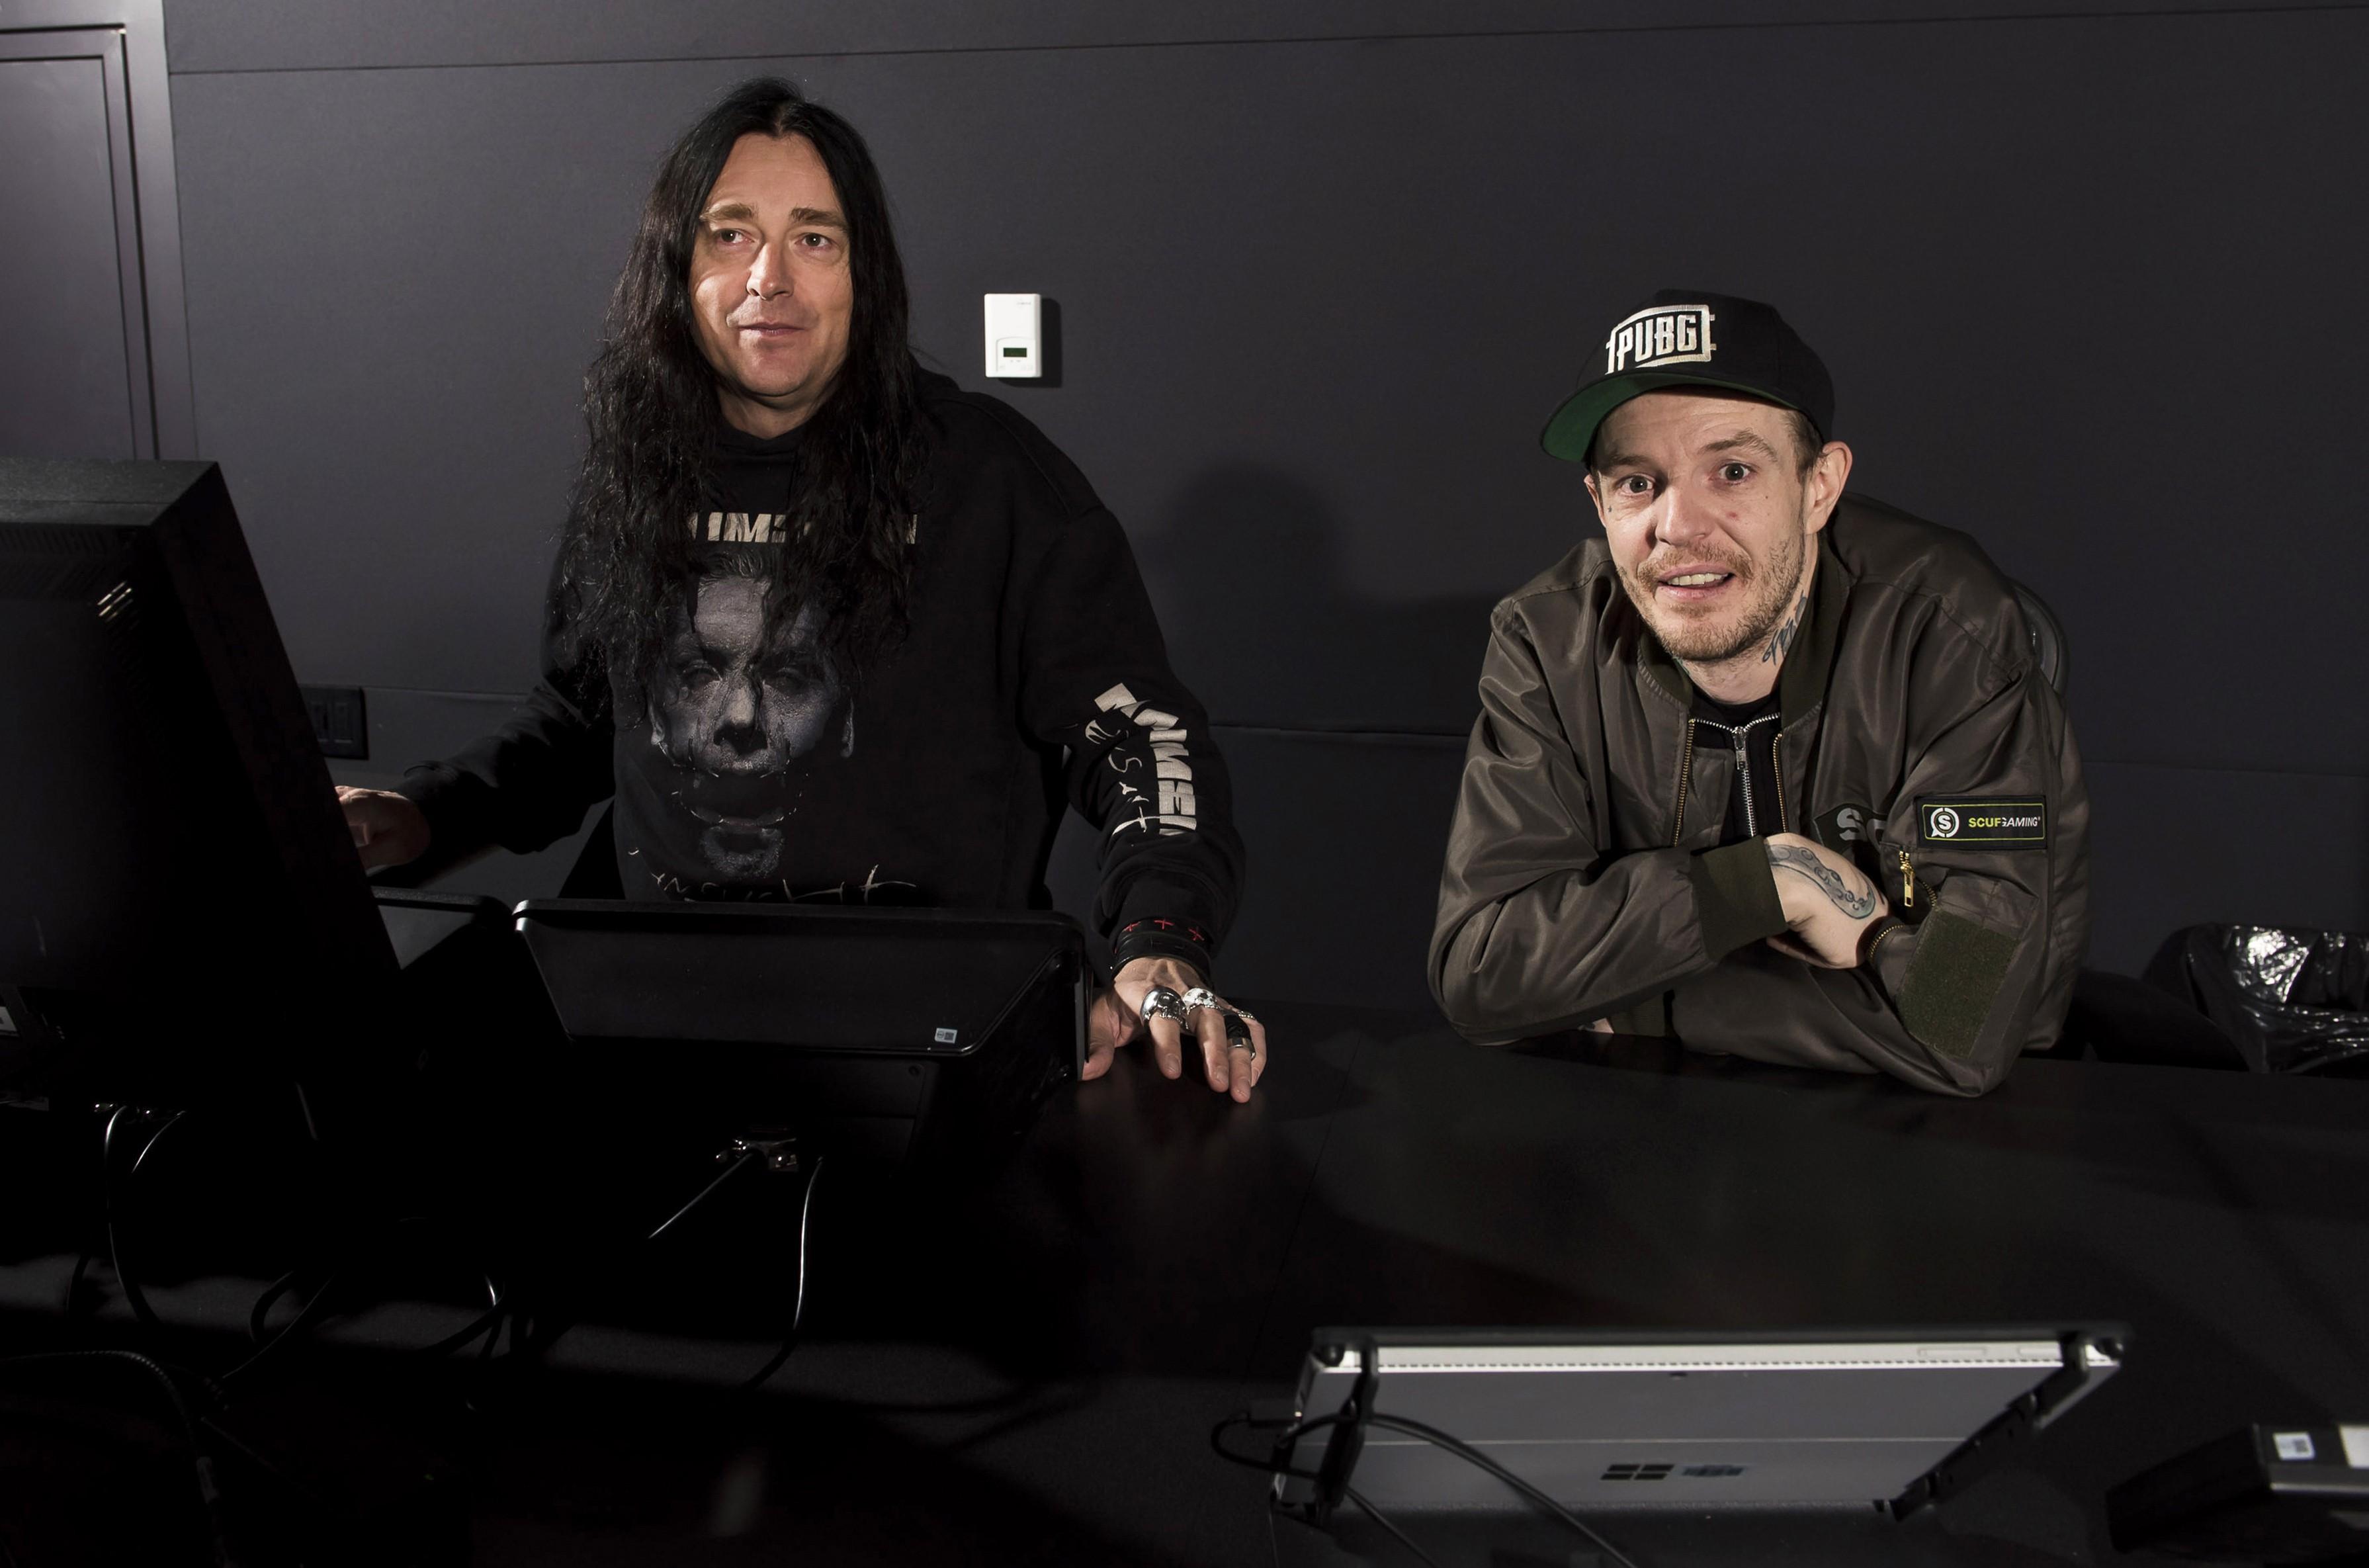 Jonas Åkerlund, left, and Joel Zimmerman, a.k.a deadmau5